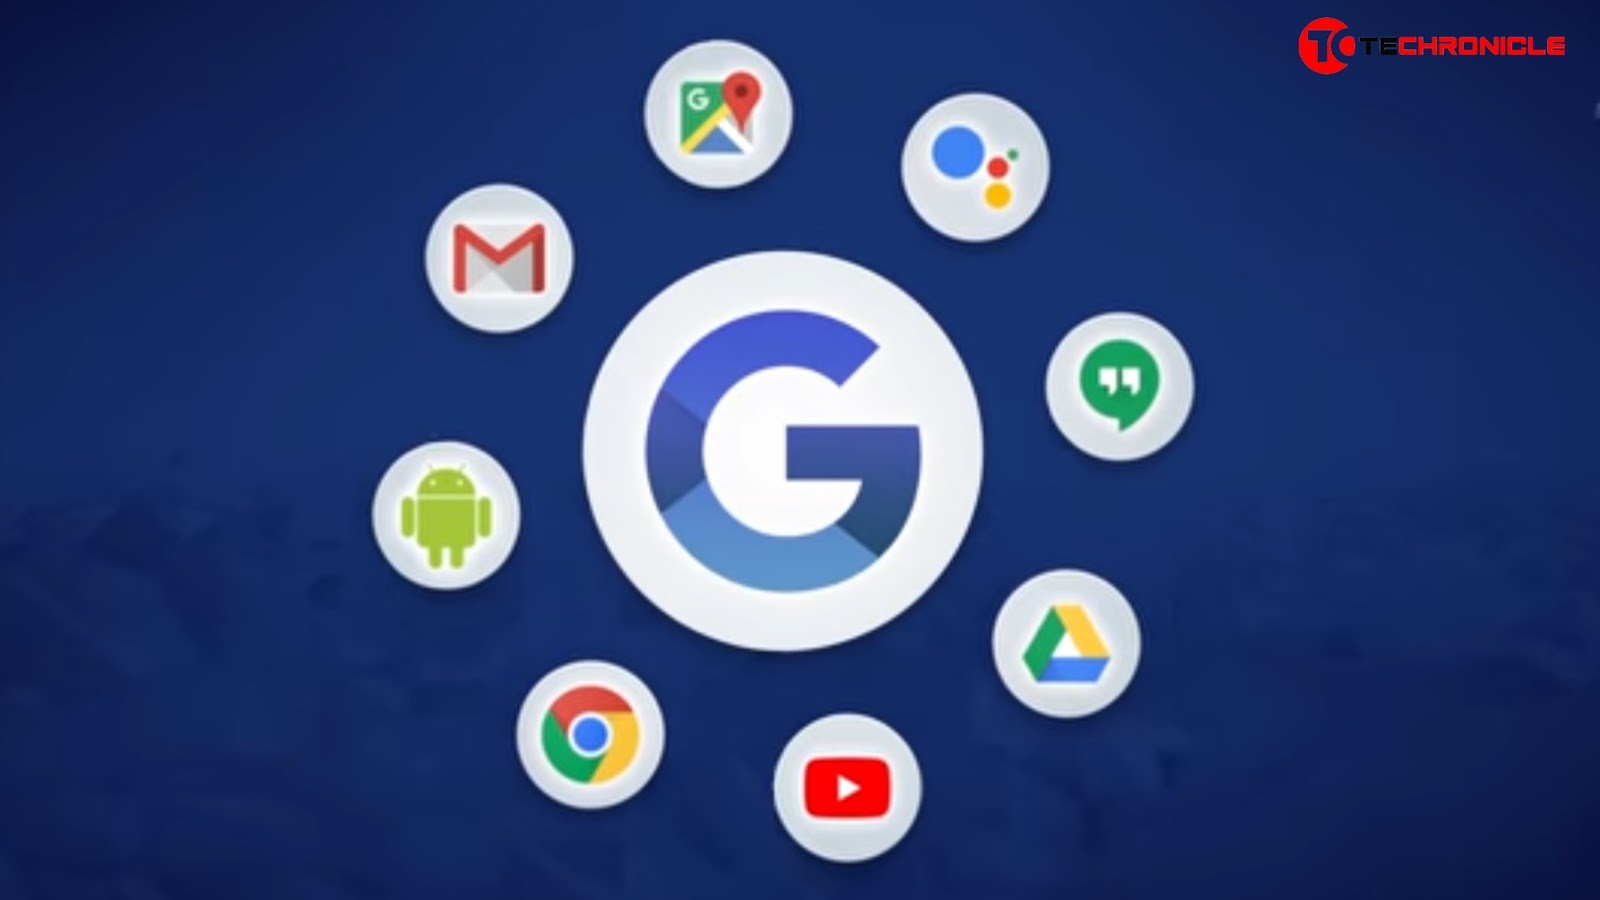 All Google Services logos Techronicle